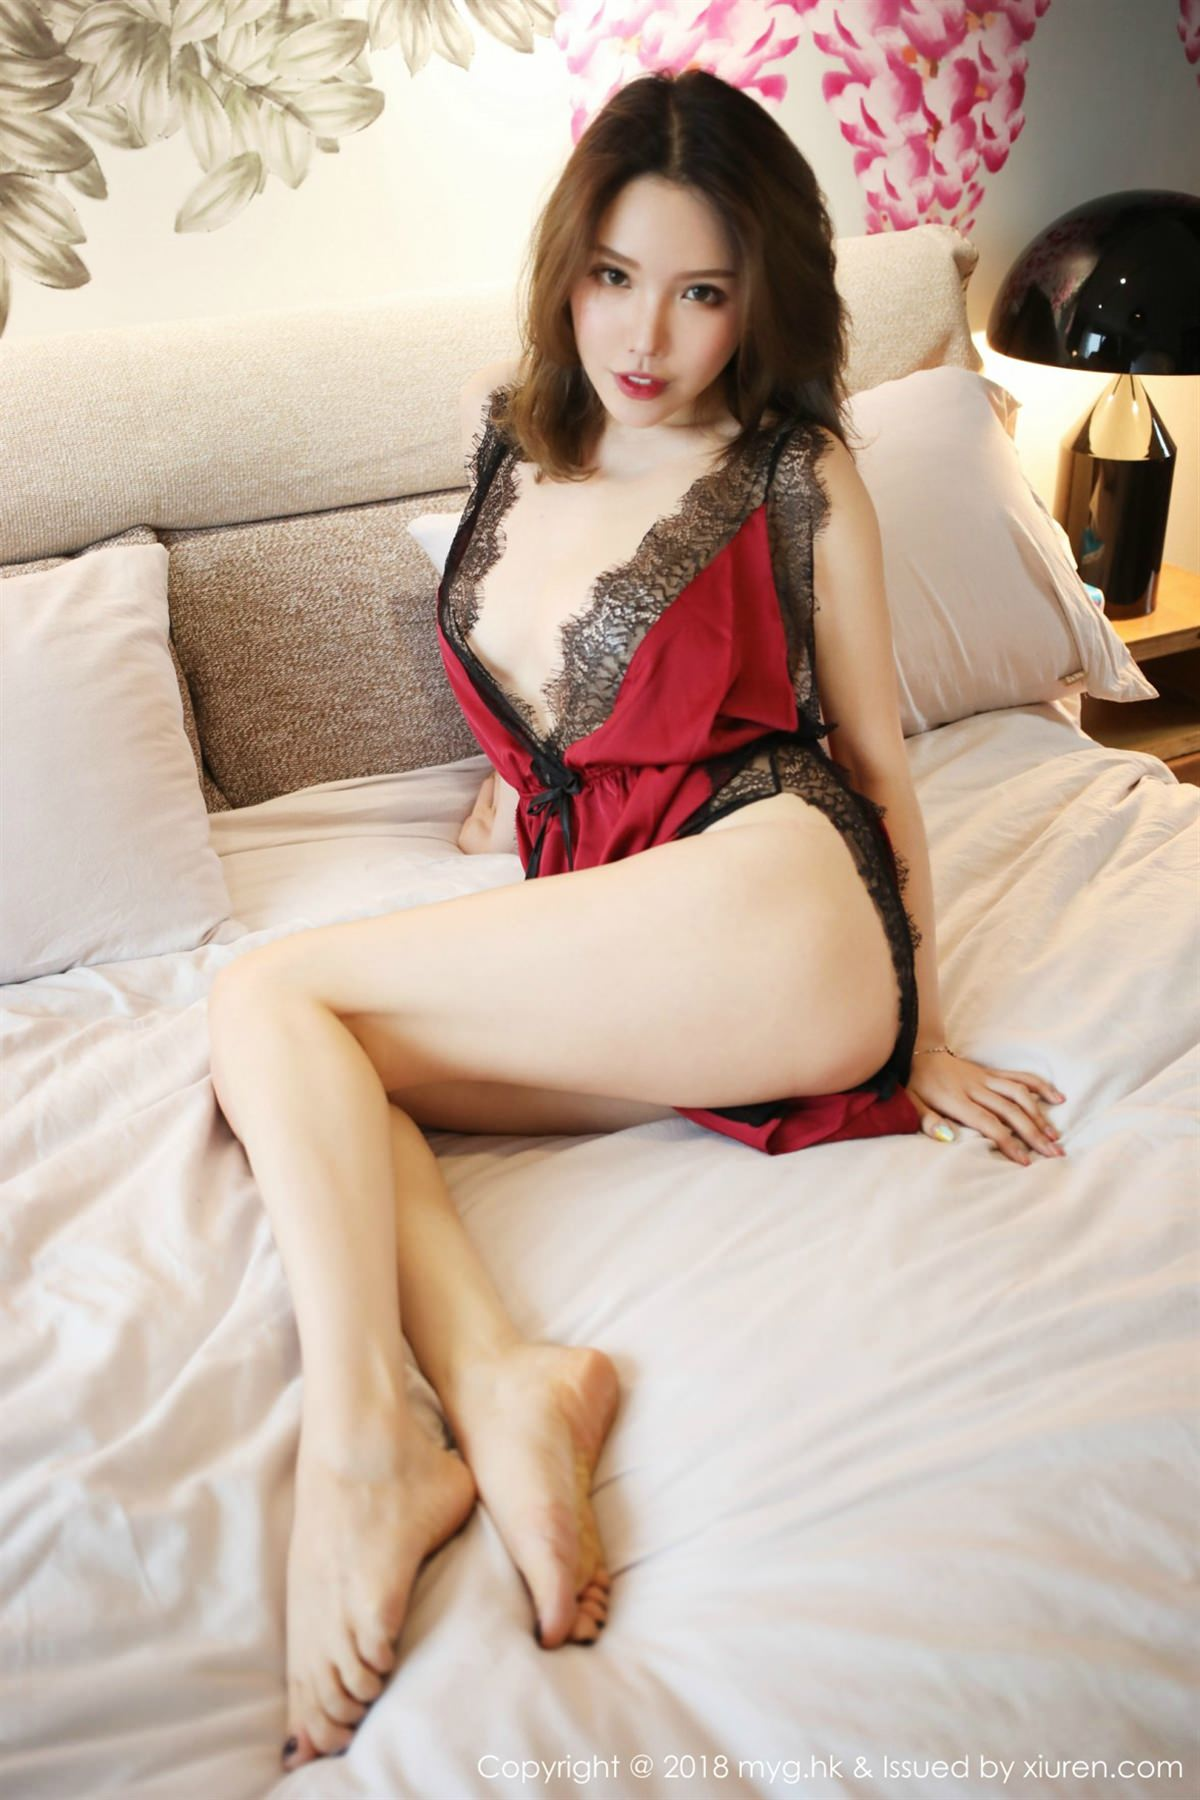 MyGirl Vol.292 10P, Huang Le Ran, mygirl